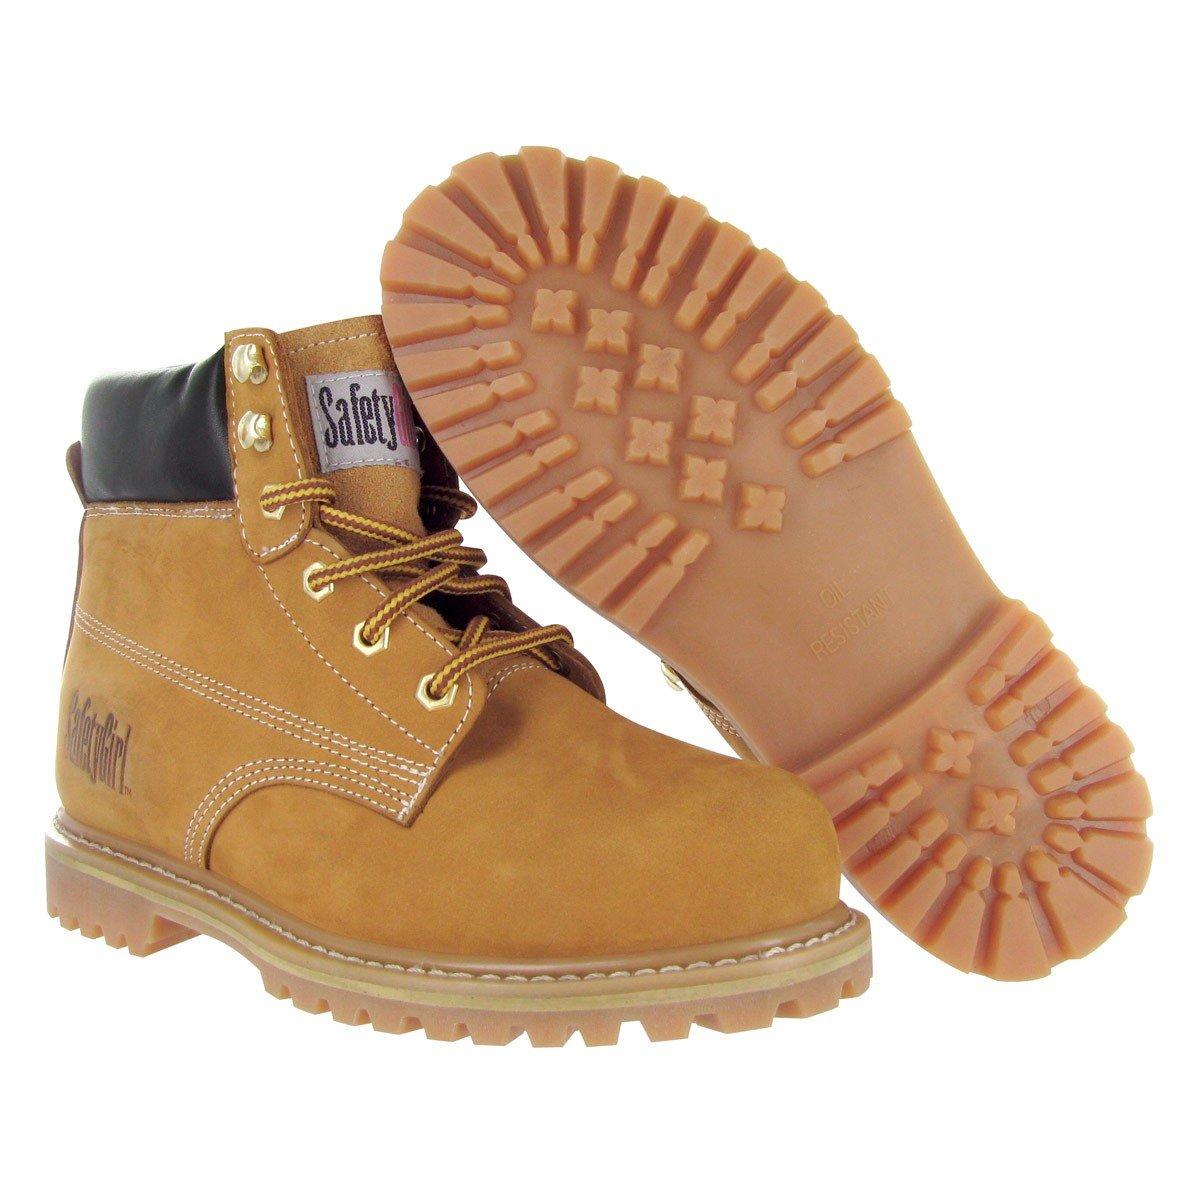 Safety Girl GS003-Tan-7W Steel Toe Work Boots - Tan - 7W, English, Capacity, Volume, Leather, 7W, Tan ()